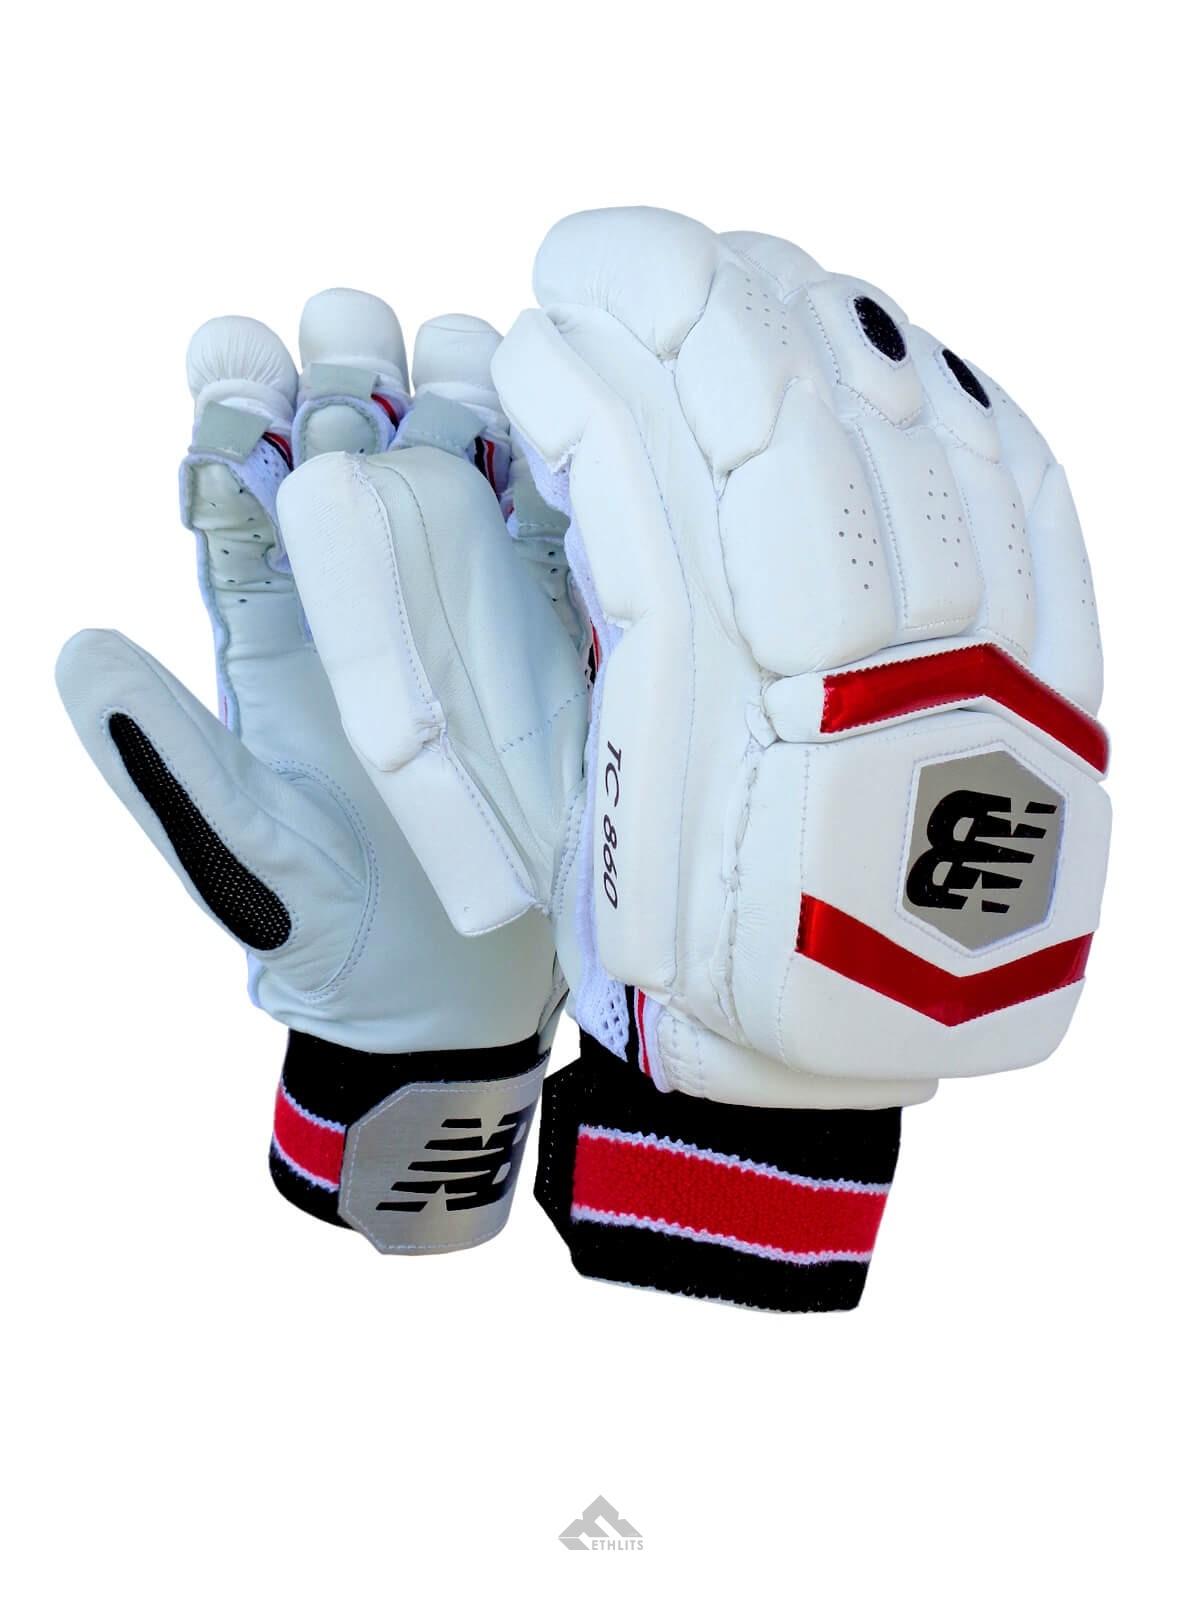 new balance junier cticket gloves